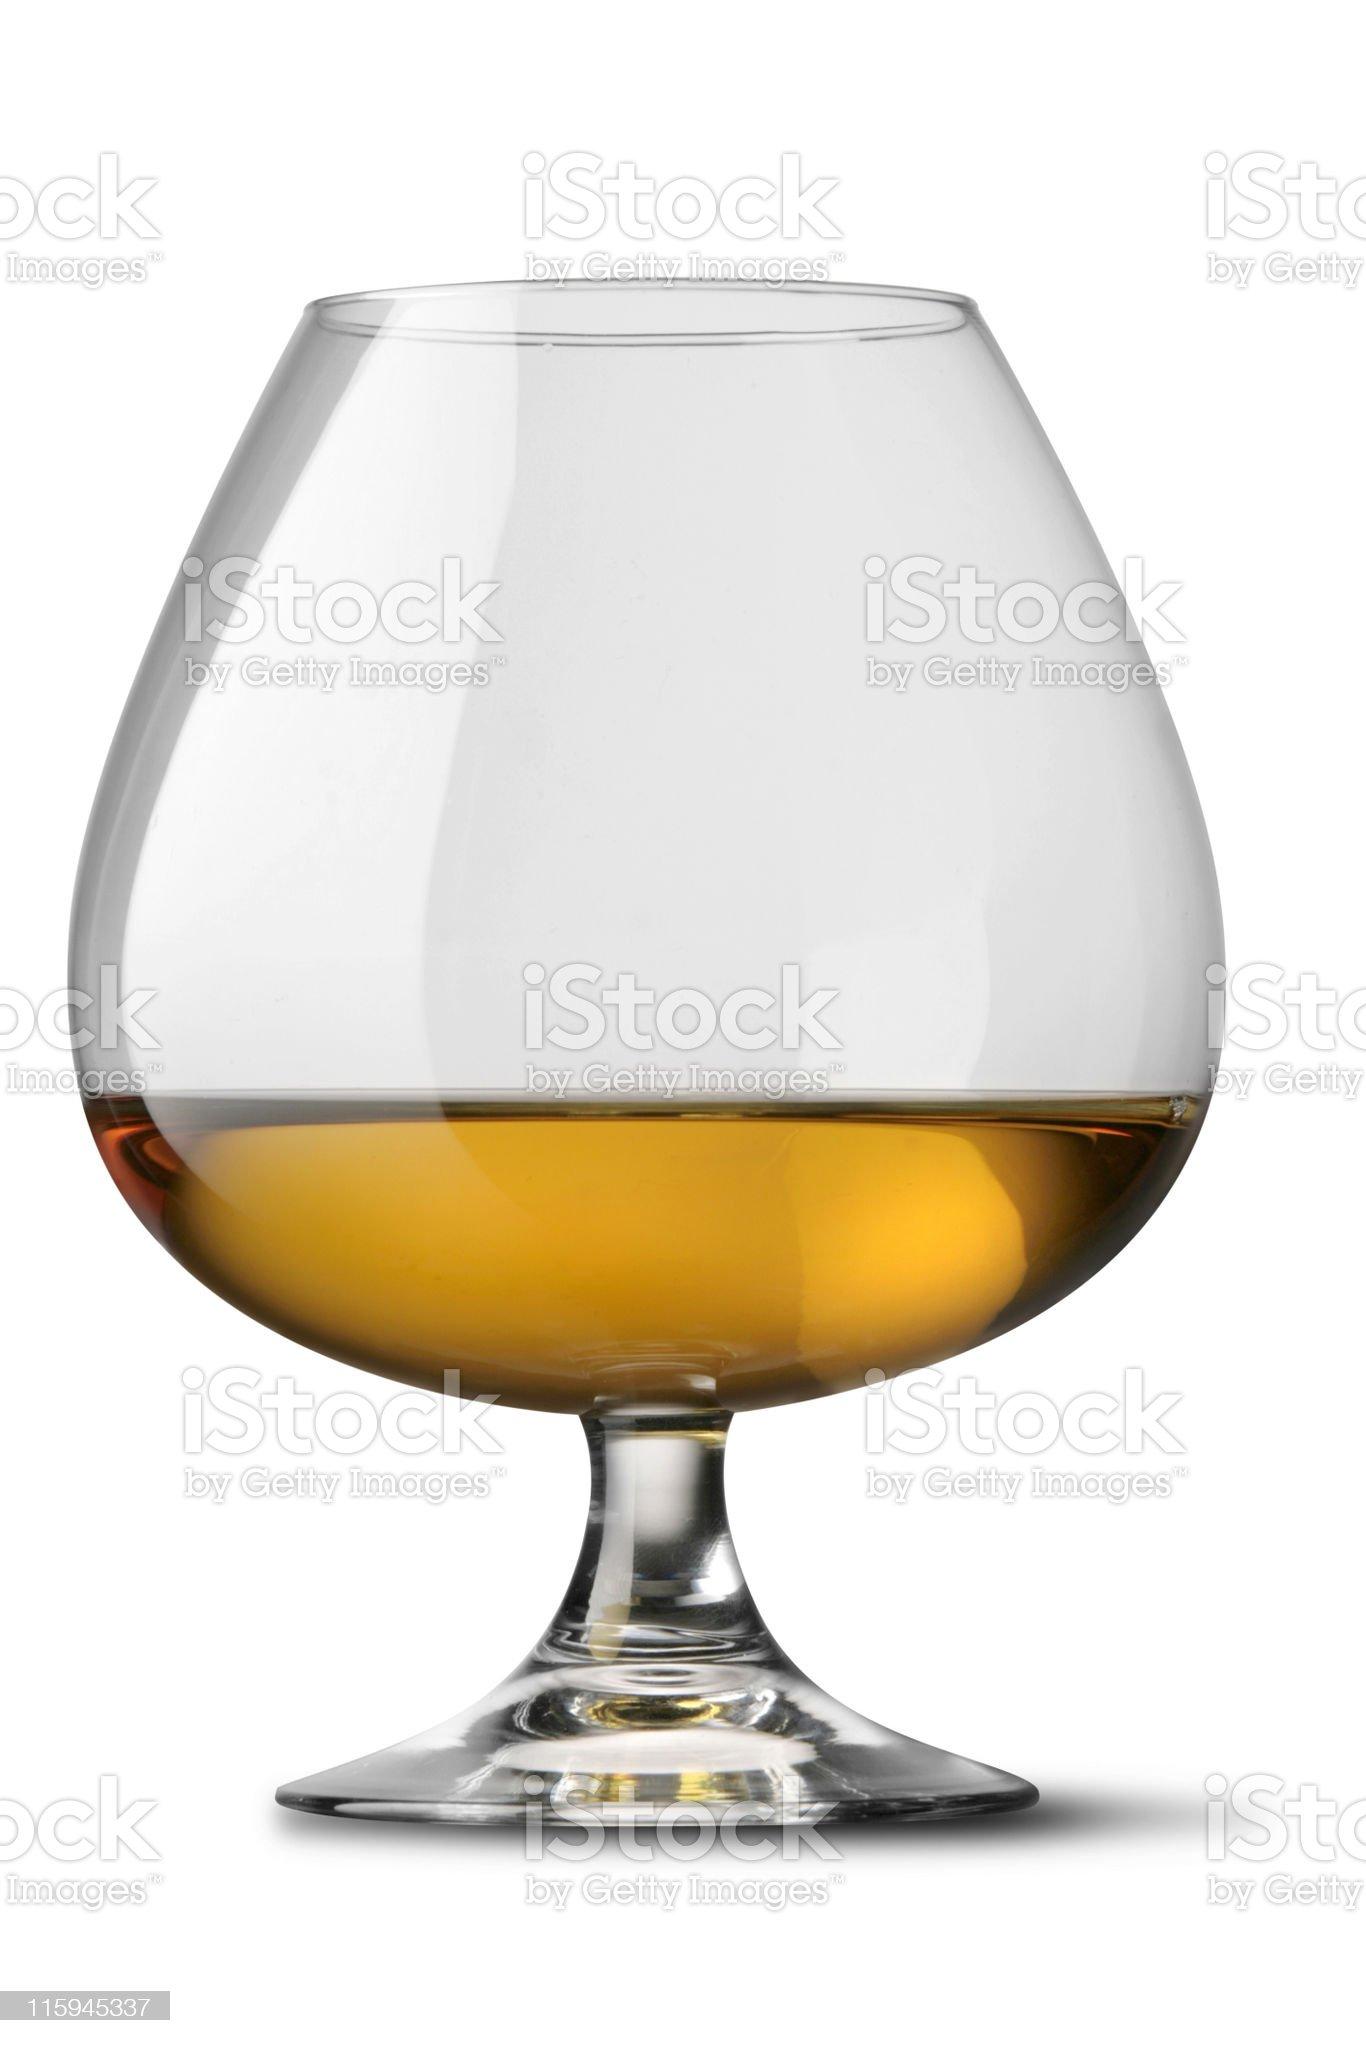 Drinks: Cognac royalty-free stock photo